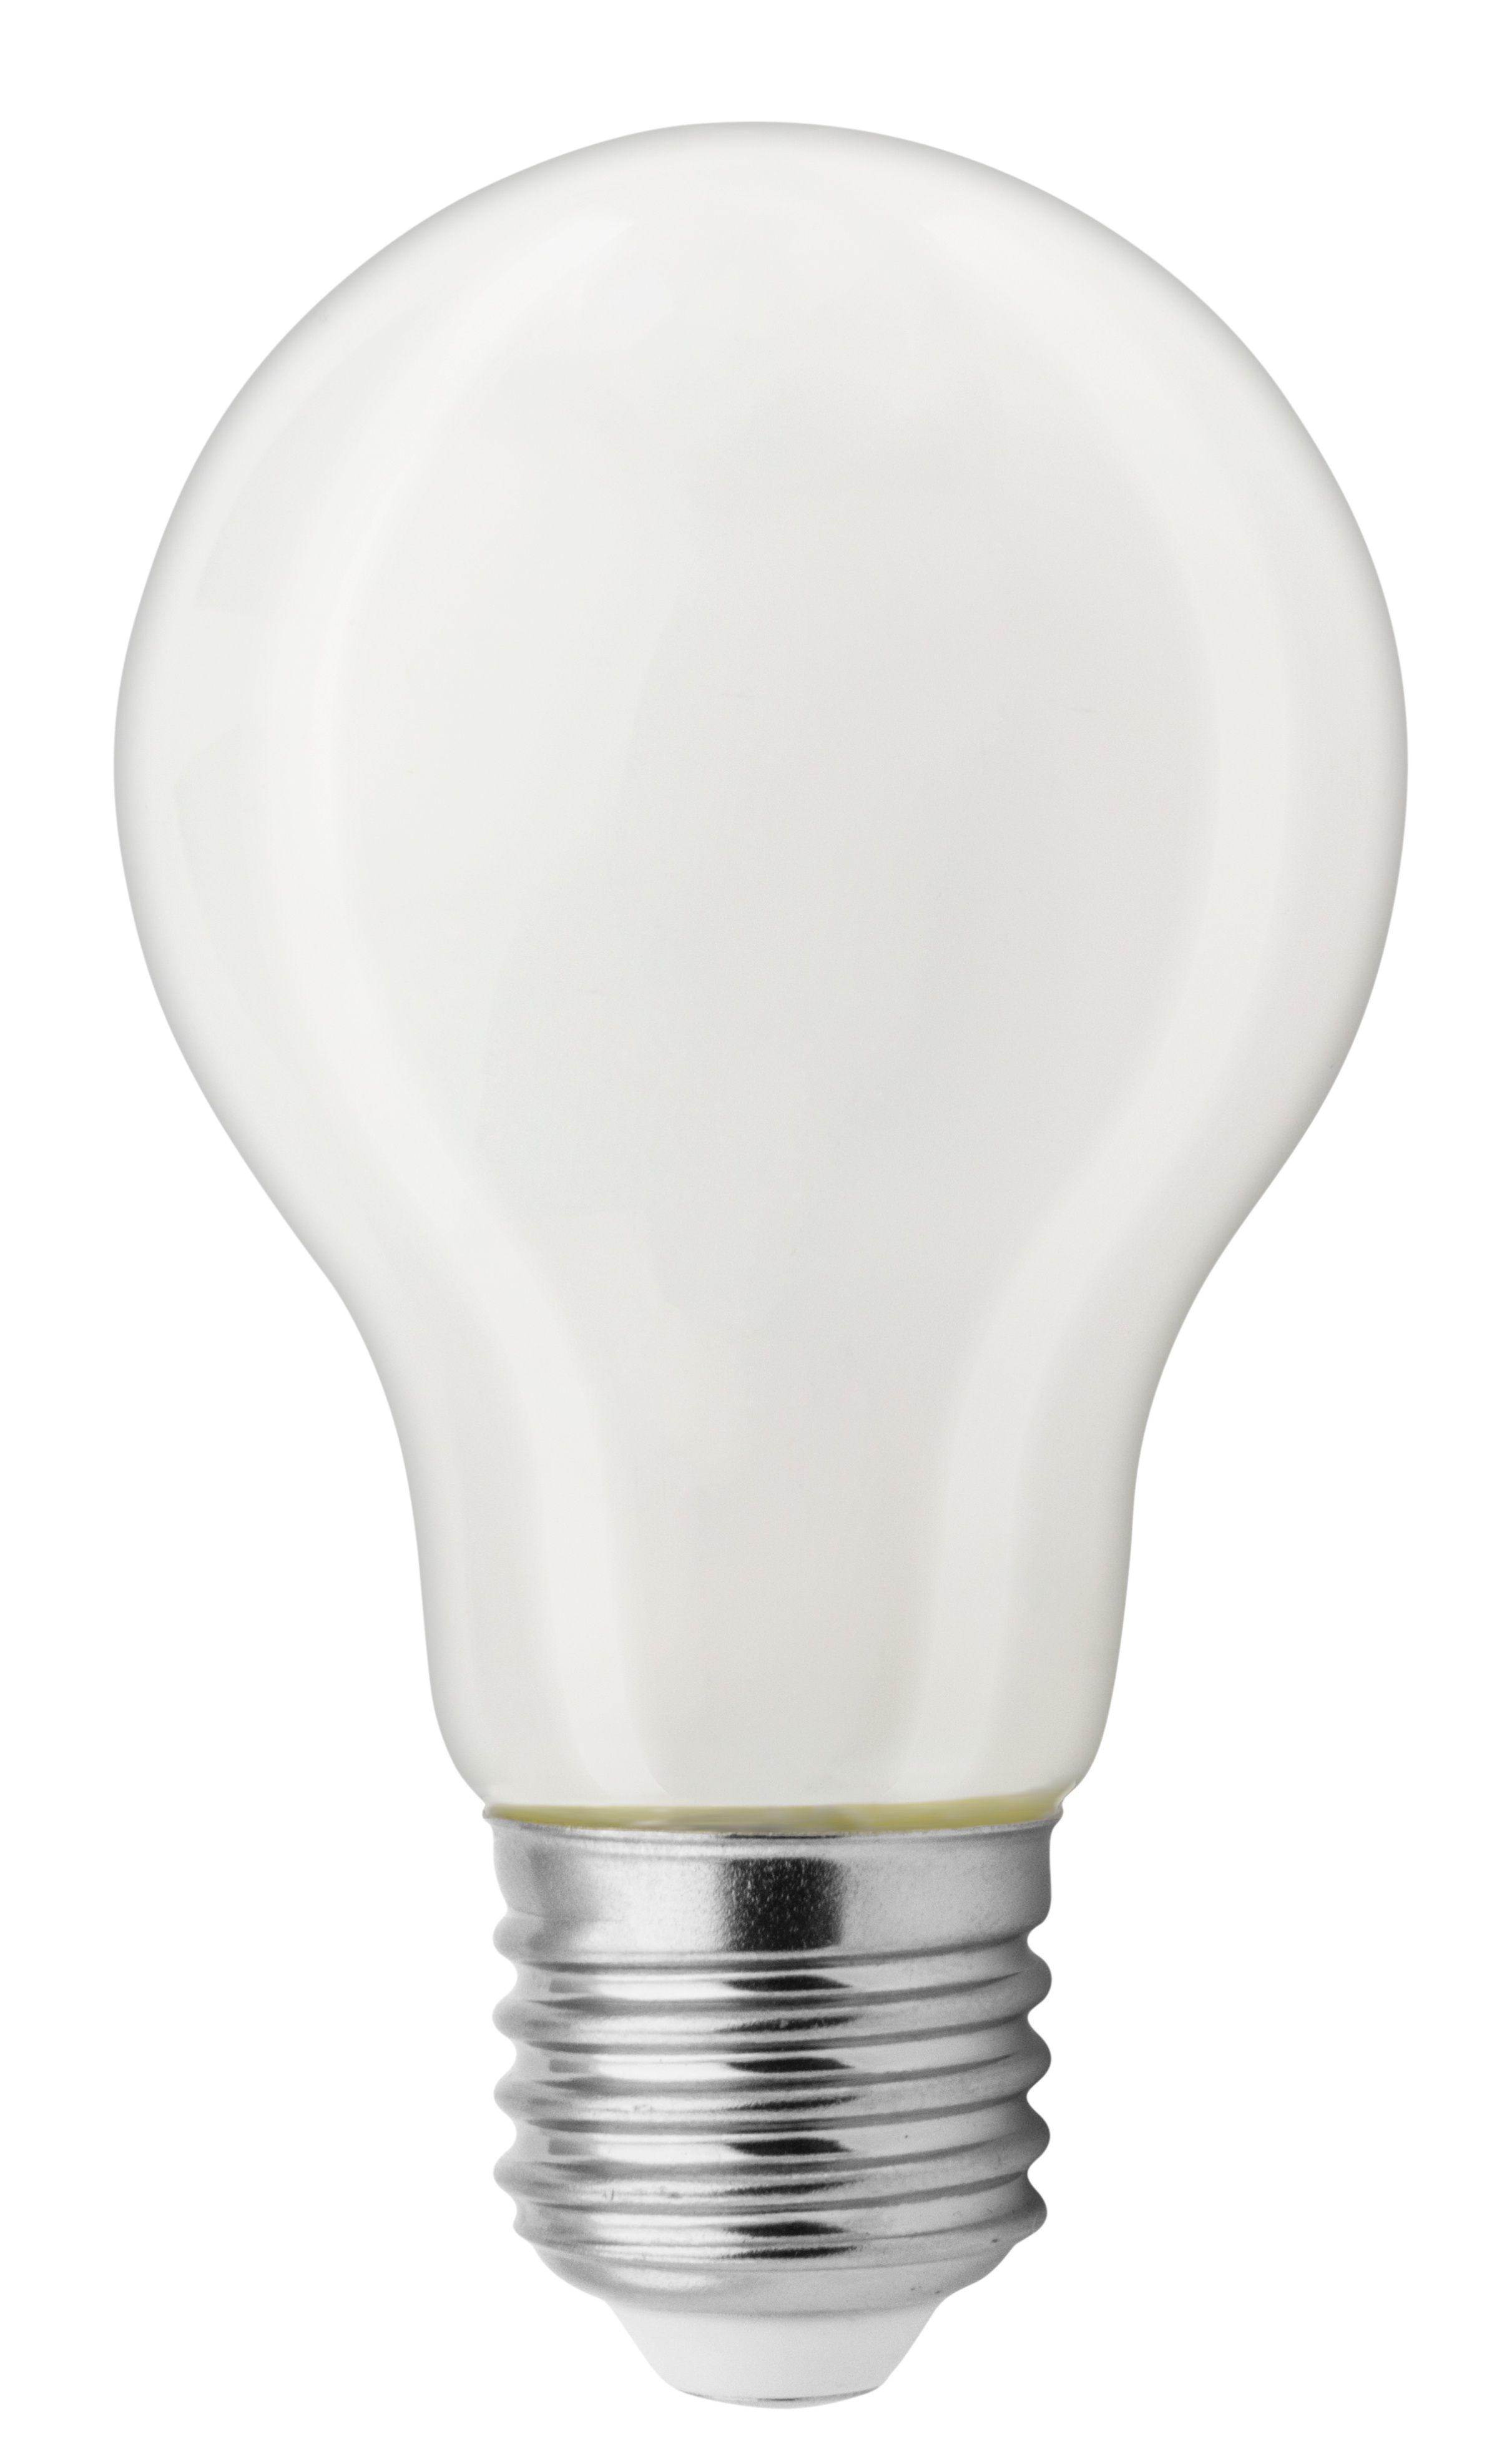 GE Lyspære LED Glass Norm. 8W E27 93046030 (Kan sendes i brev)